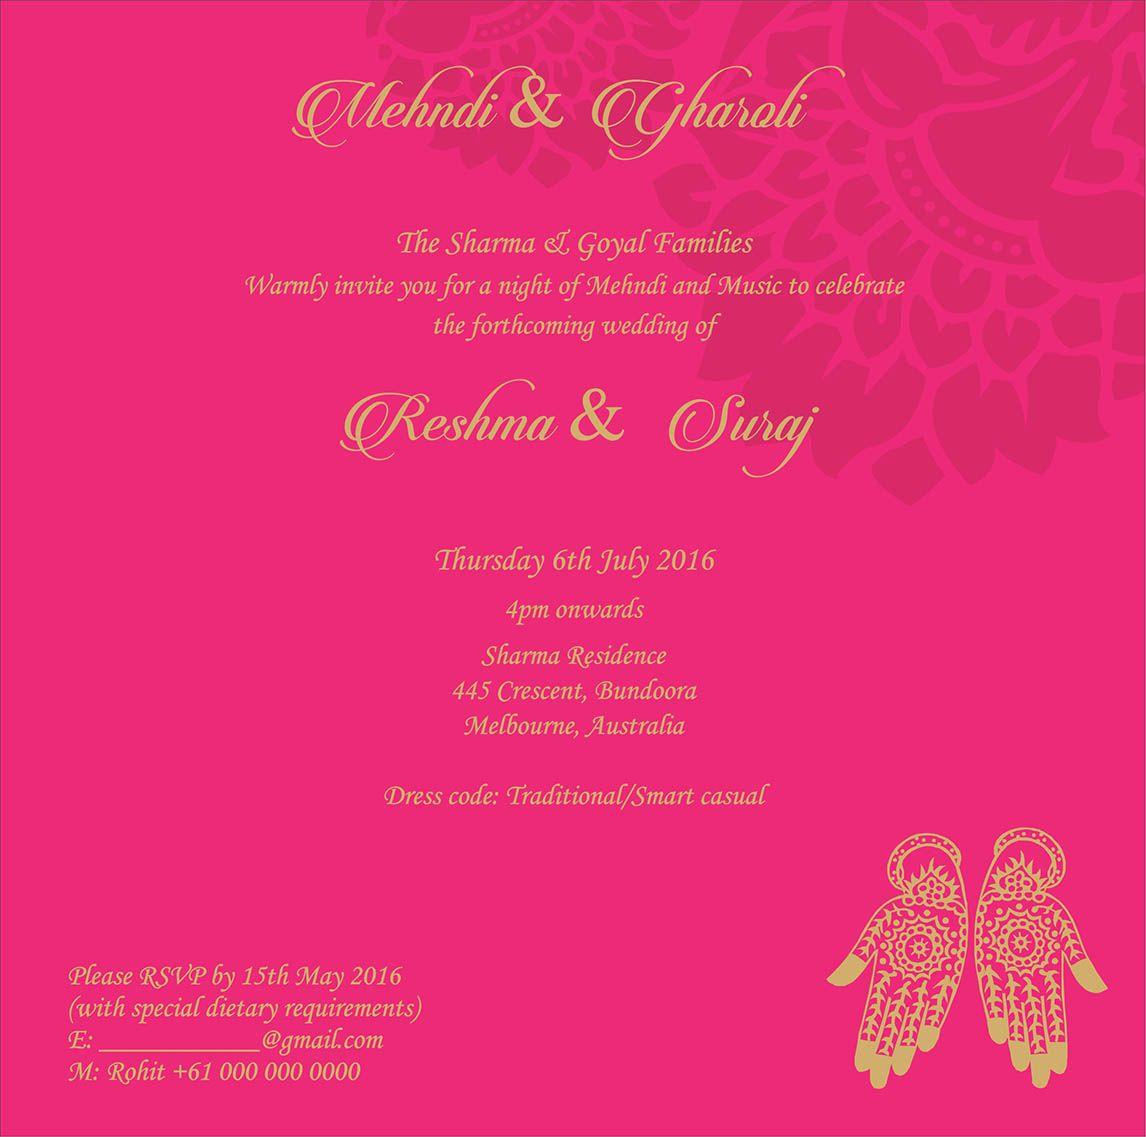 Wedding Invitation Wording For Mehndi Ceremony Marriage Invitation Card Wedding Cards Indian Wedding Cards